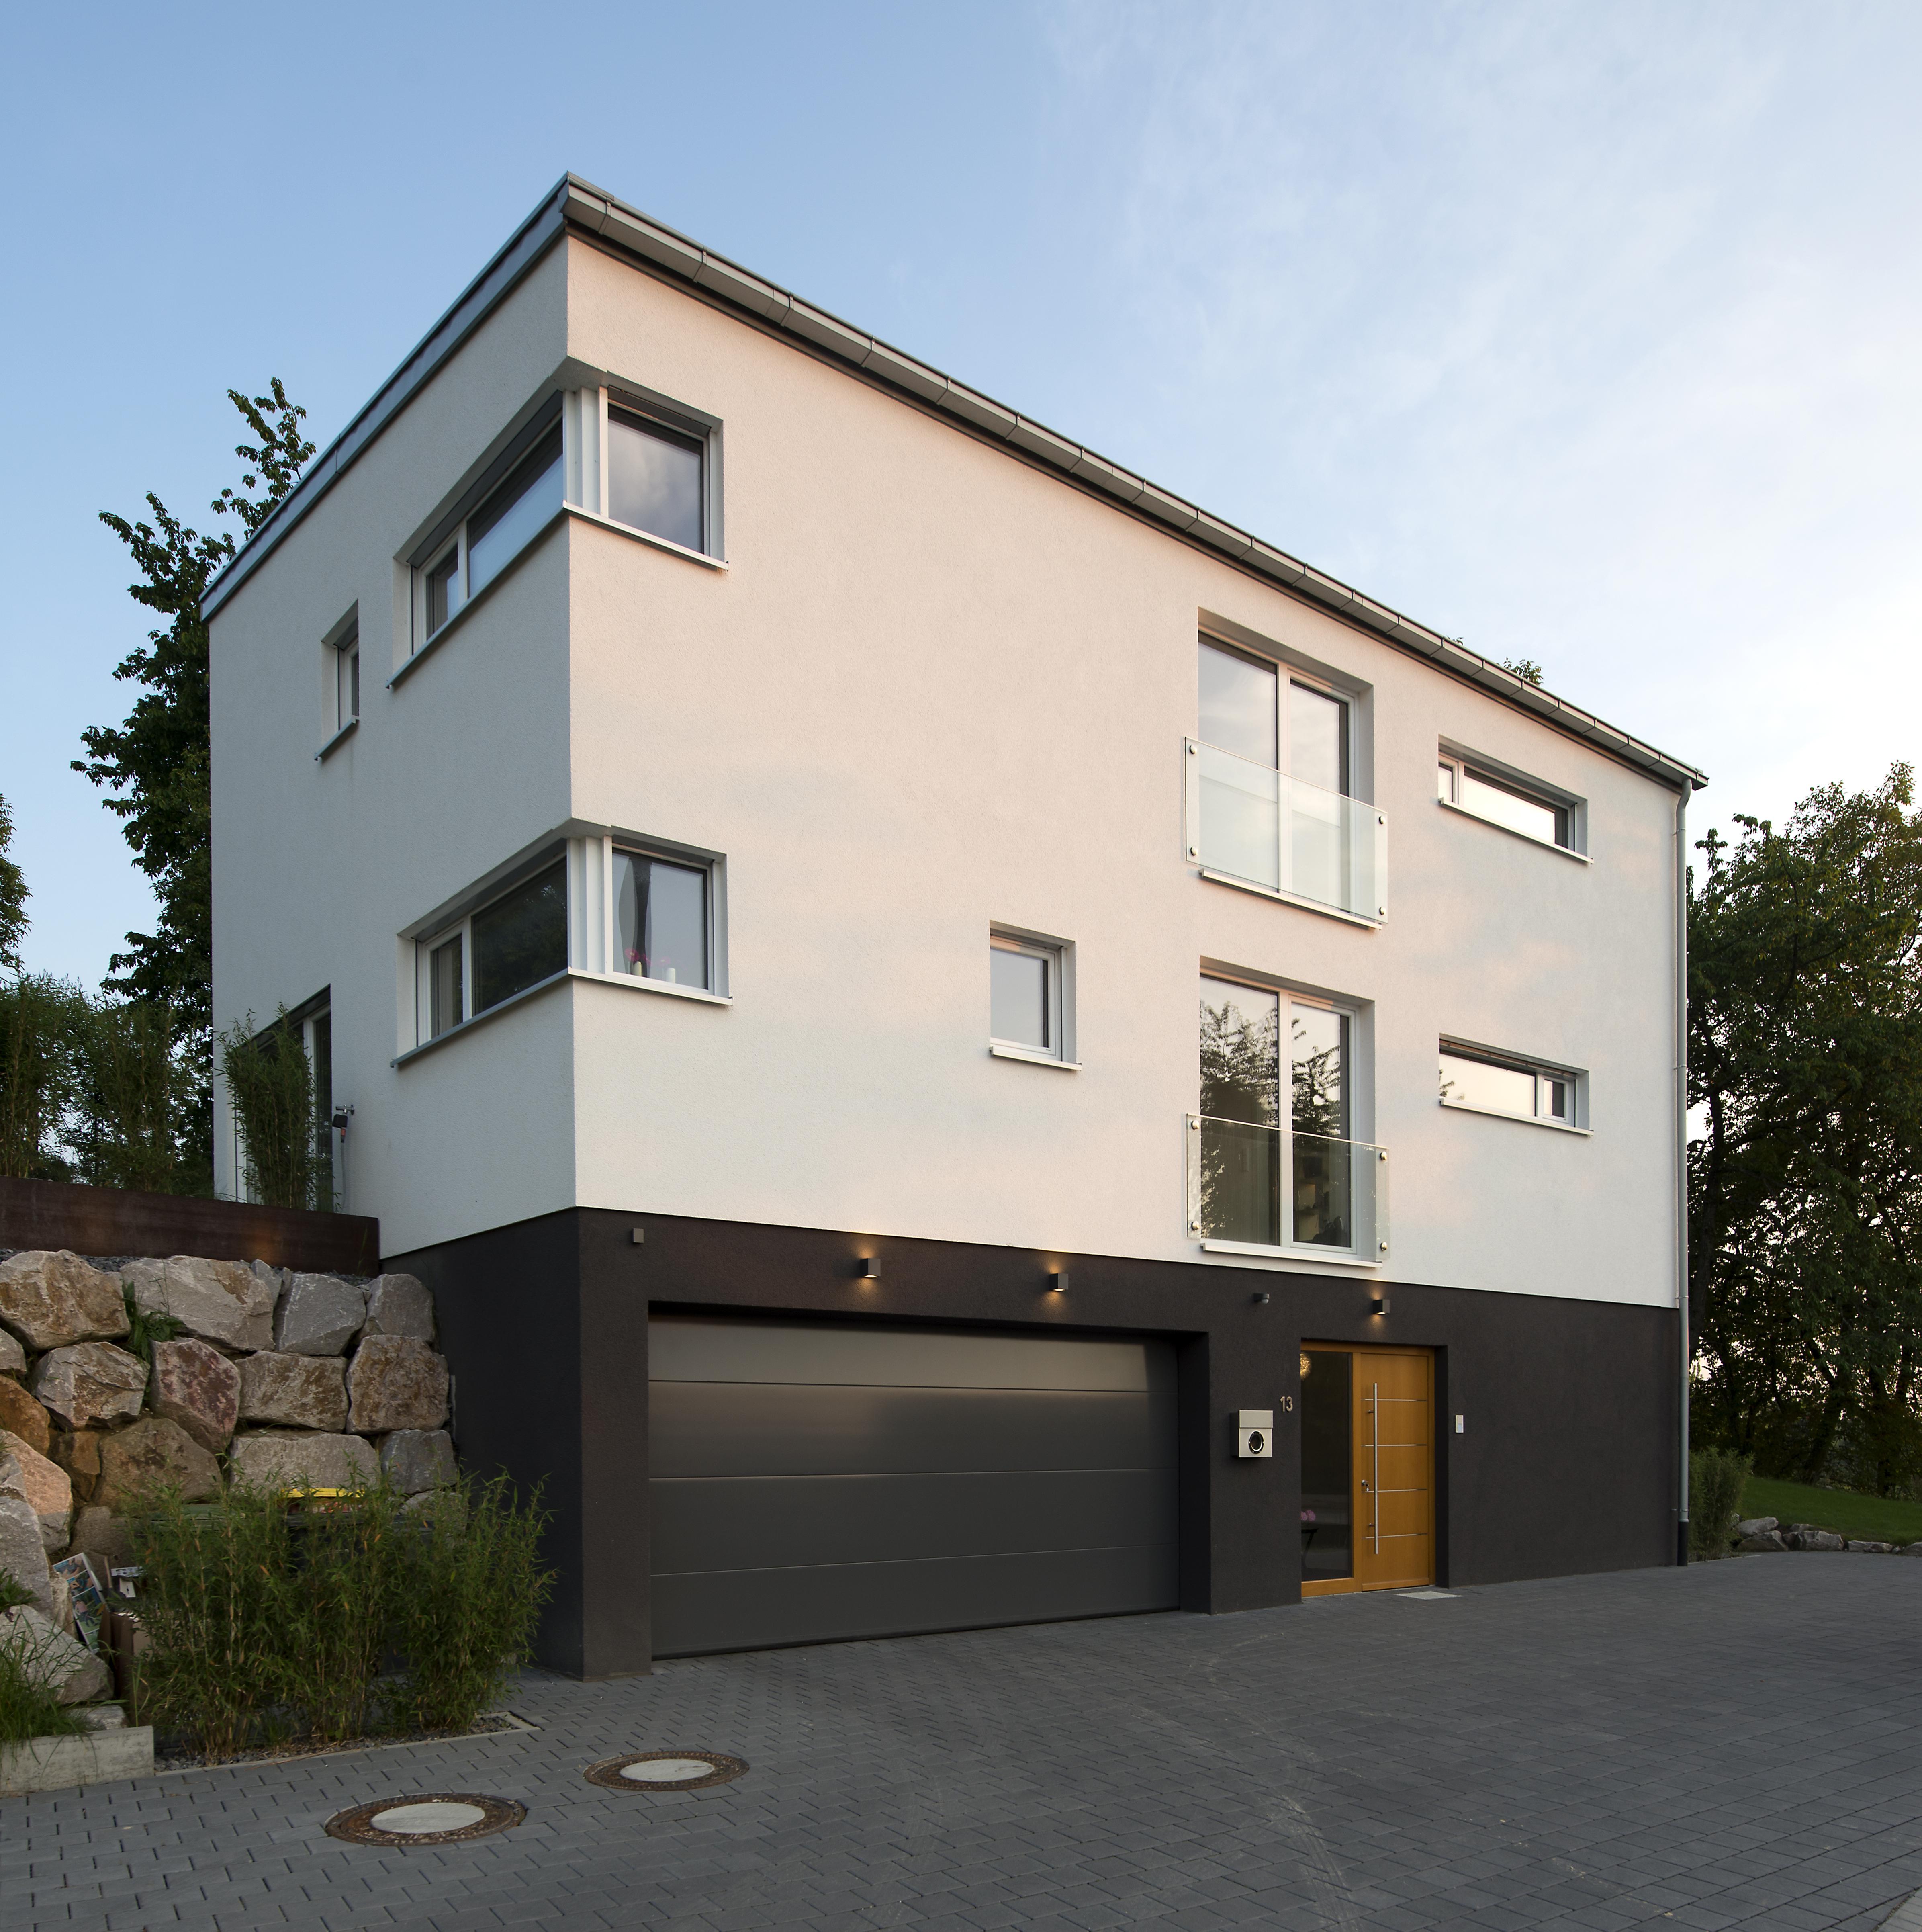 Bühl | Sentinel Haus-Blog